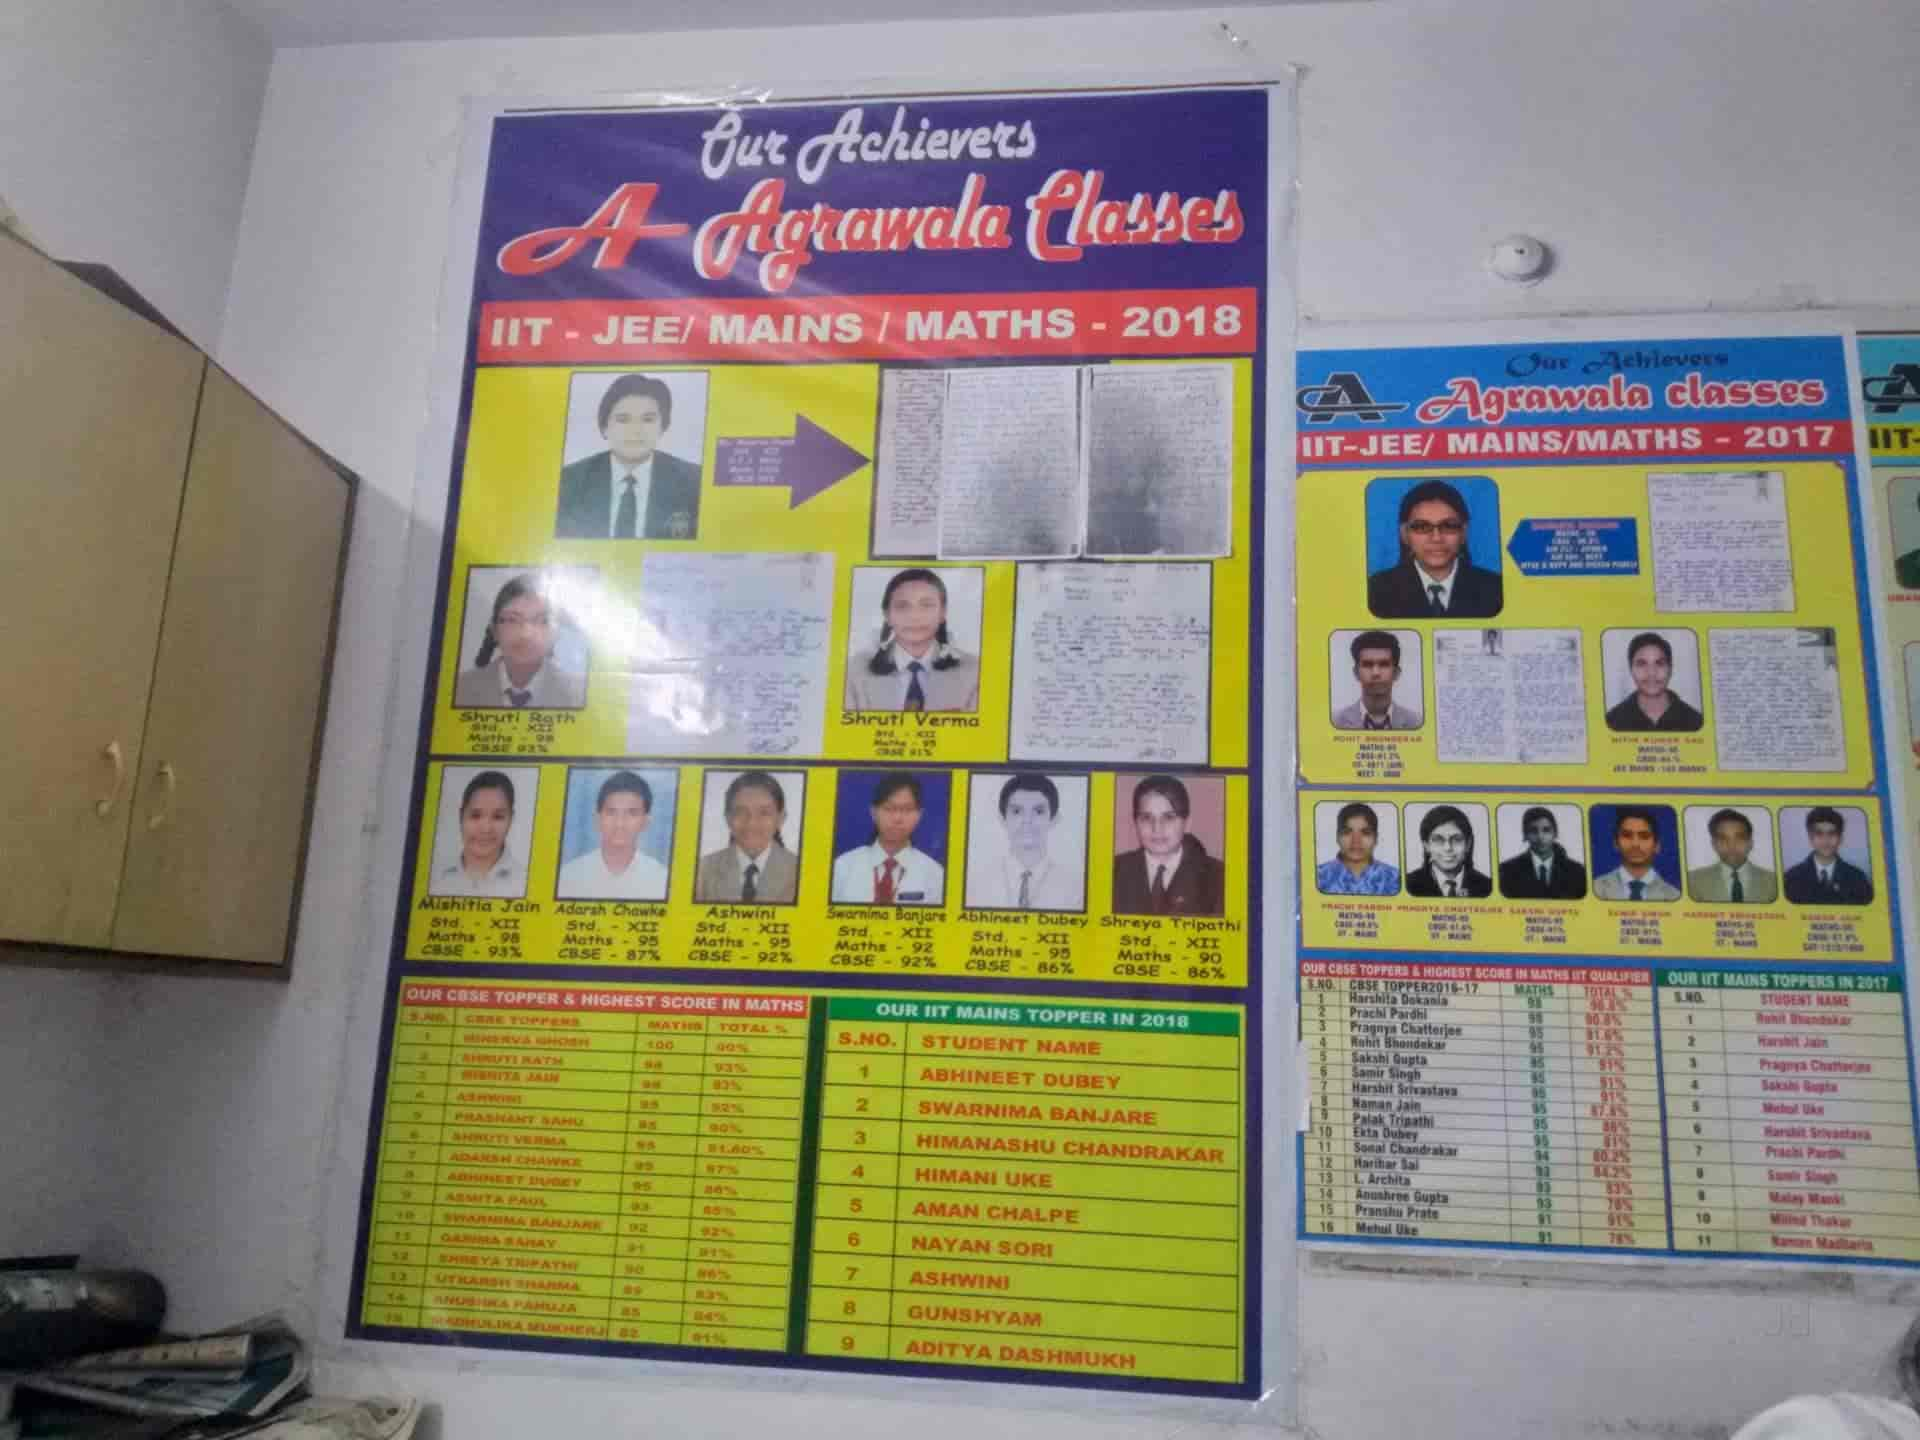 Agrawala agrawala classes, bhilai sector 10 - iit tutorials in durg